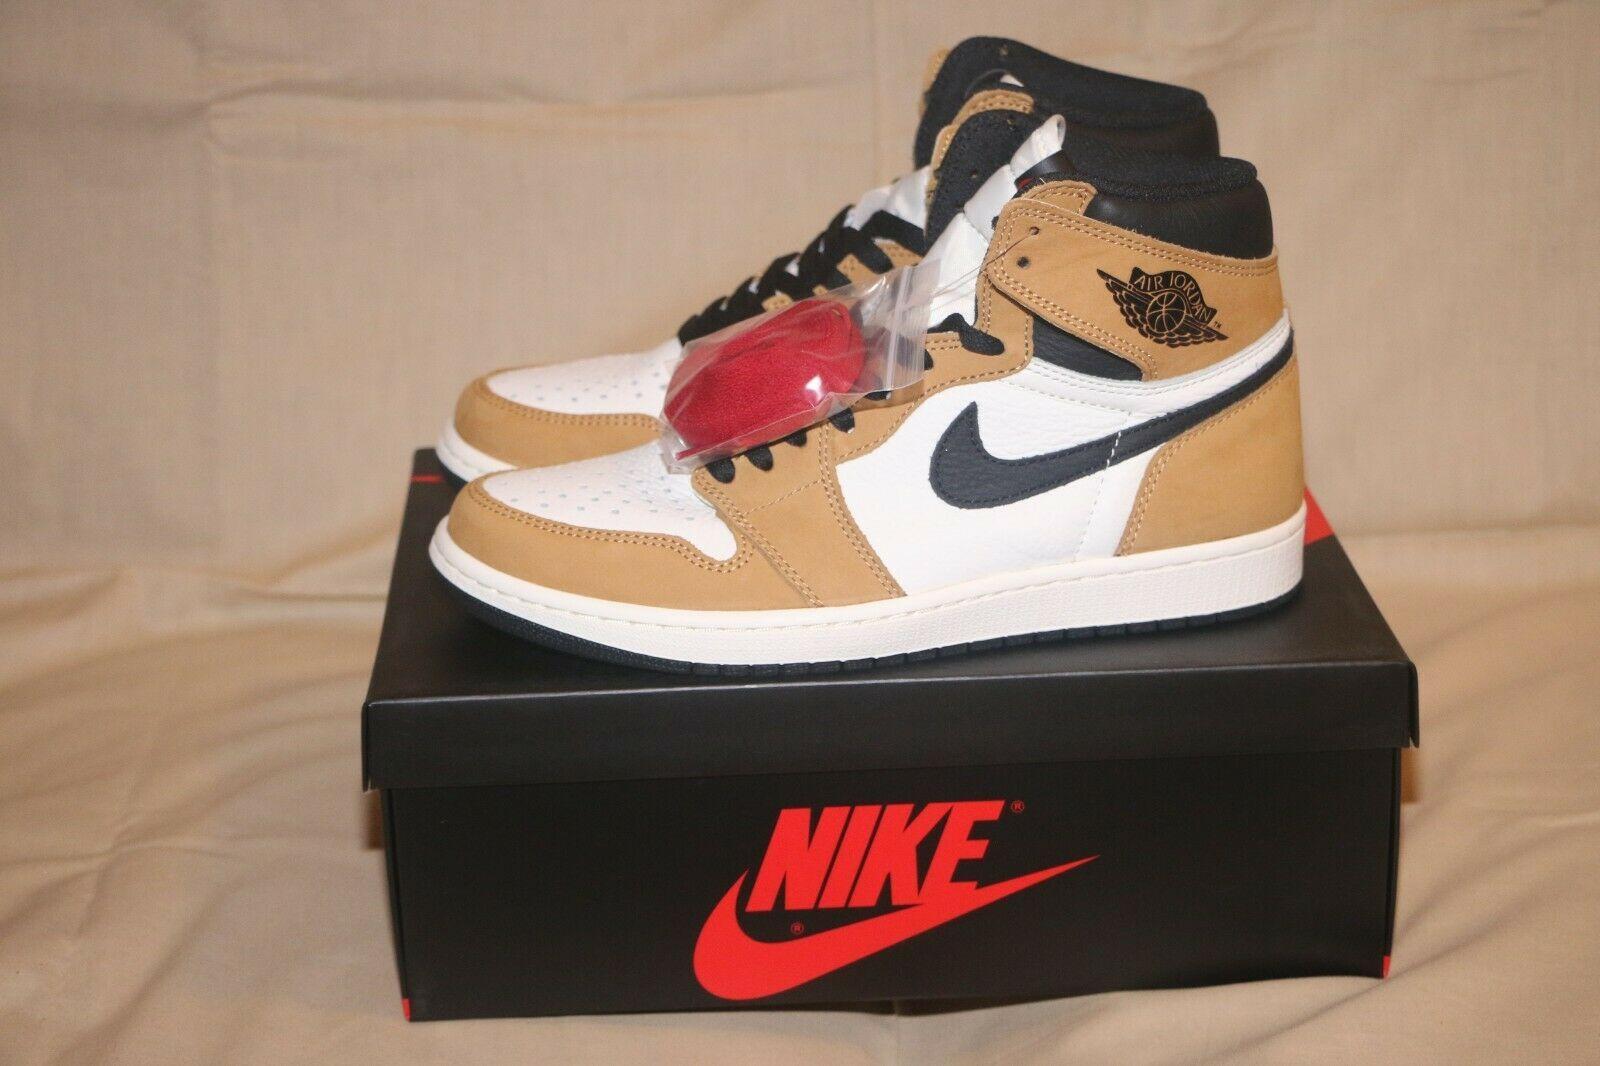 Nike Air Jordan 1 Retro High Og Rookie Of The Year Size 9 555088